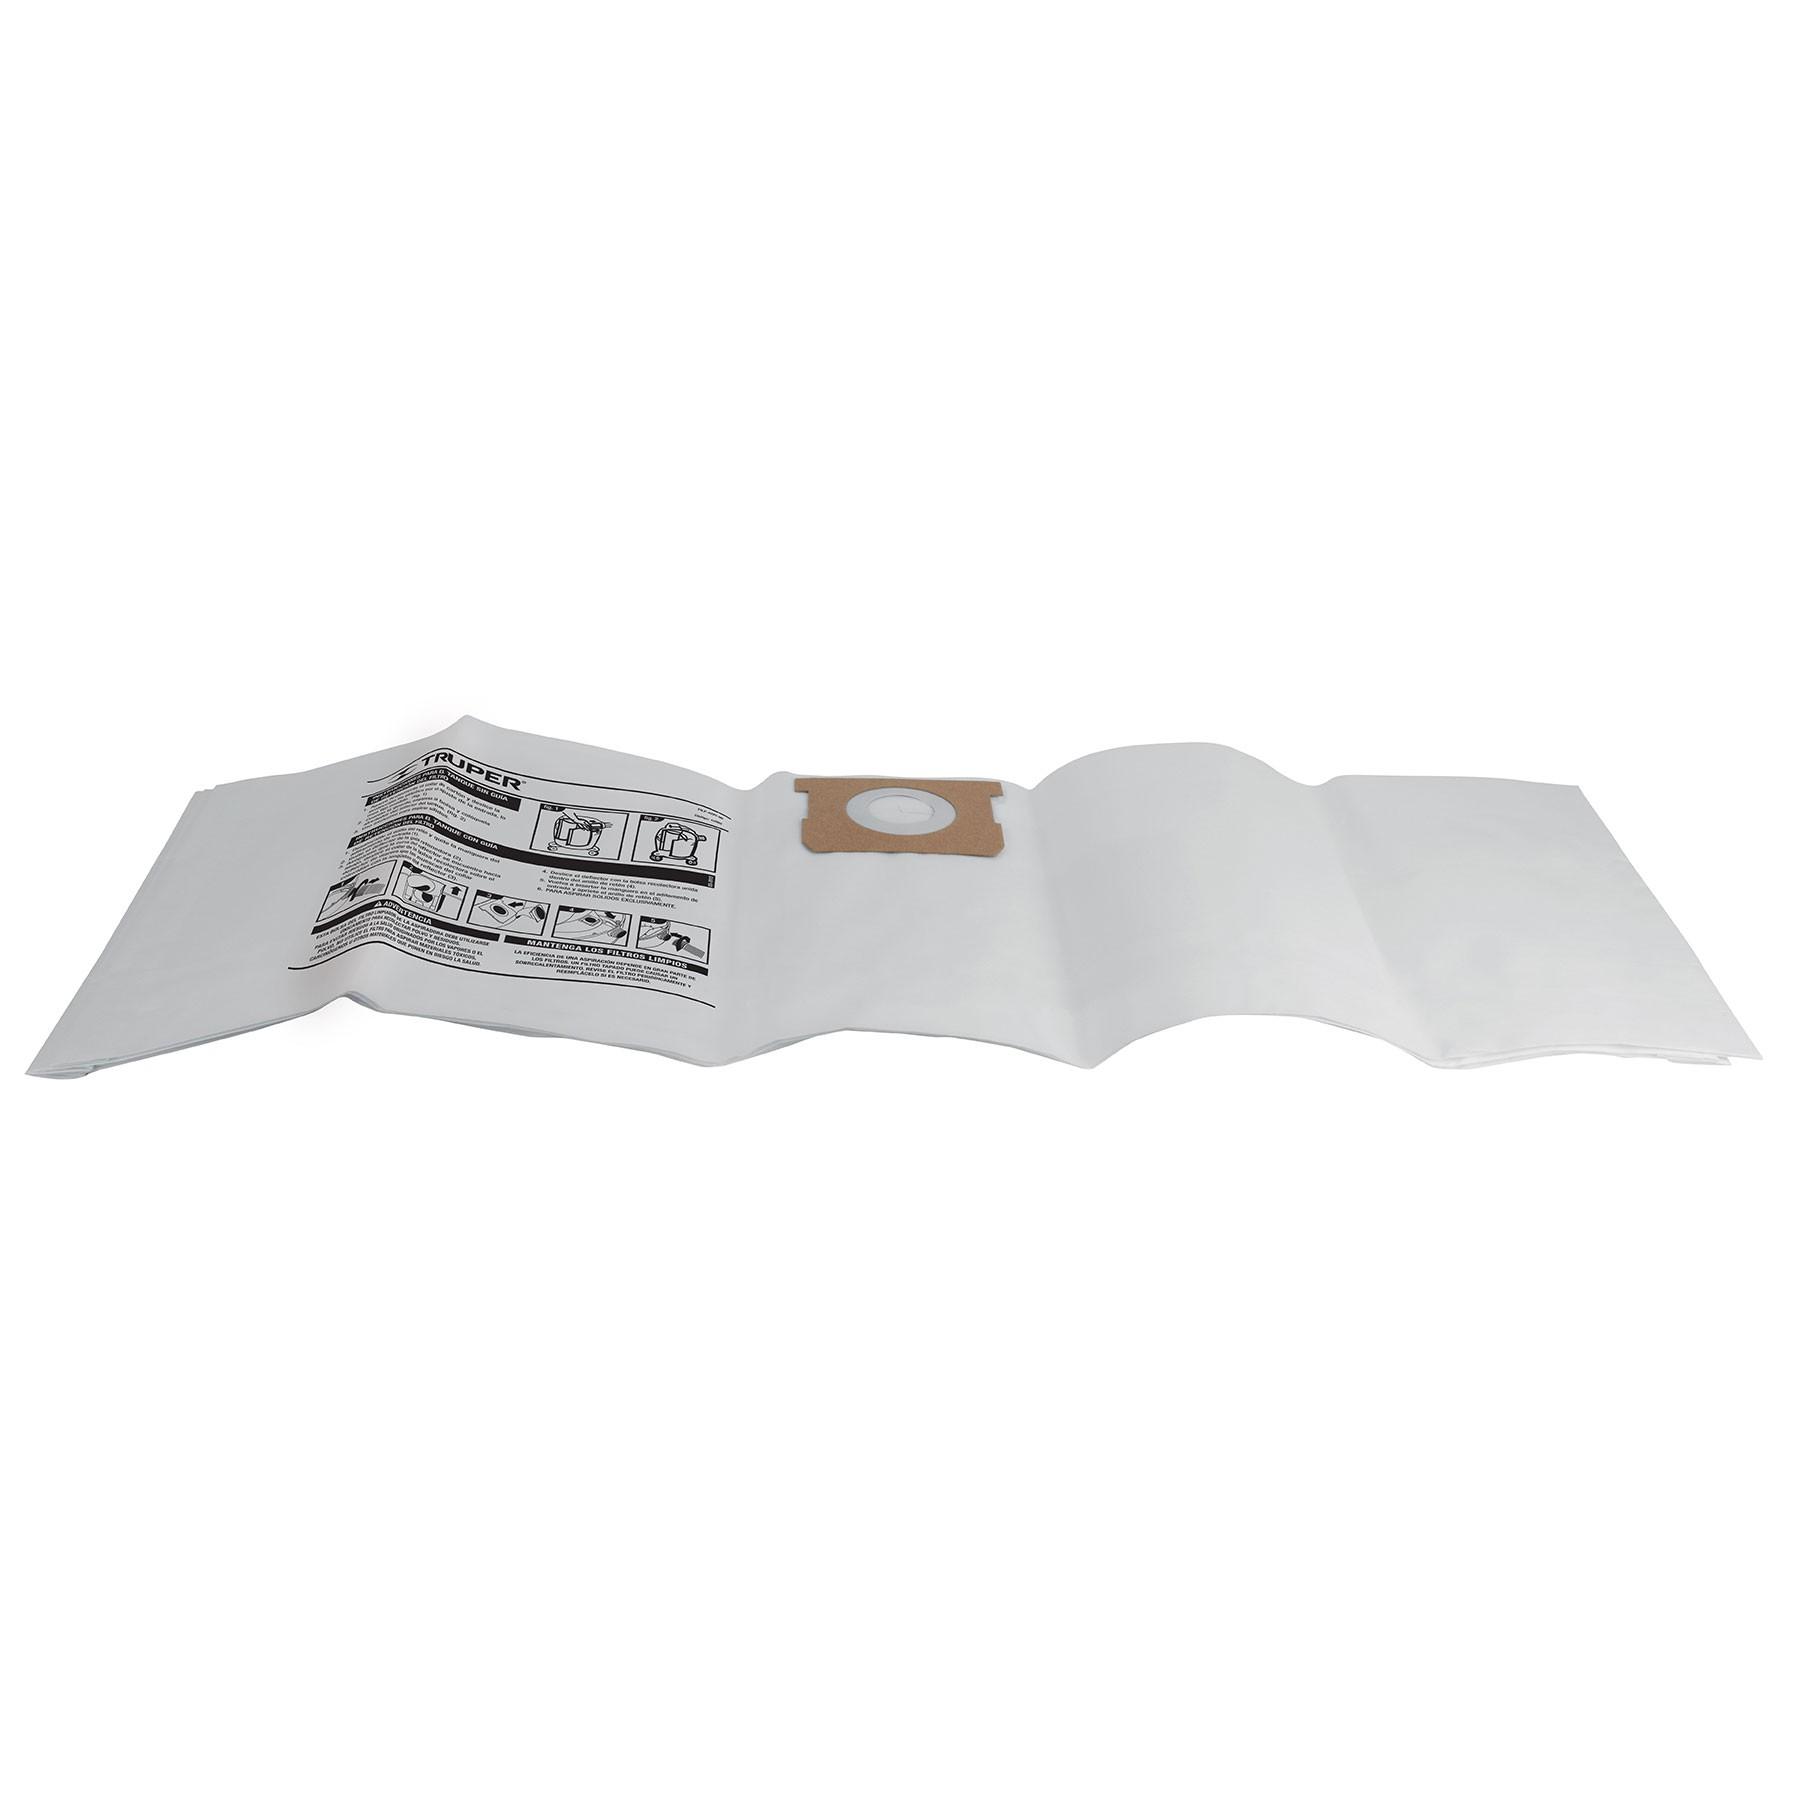 Filtro de papel para aspiradora ASPI-06